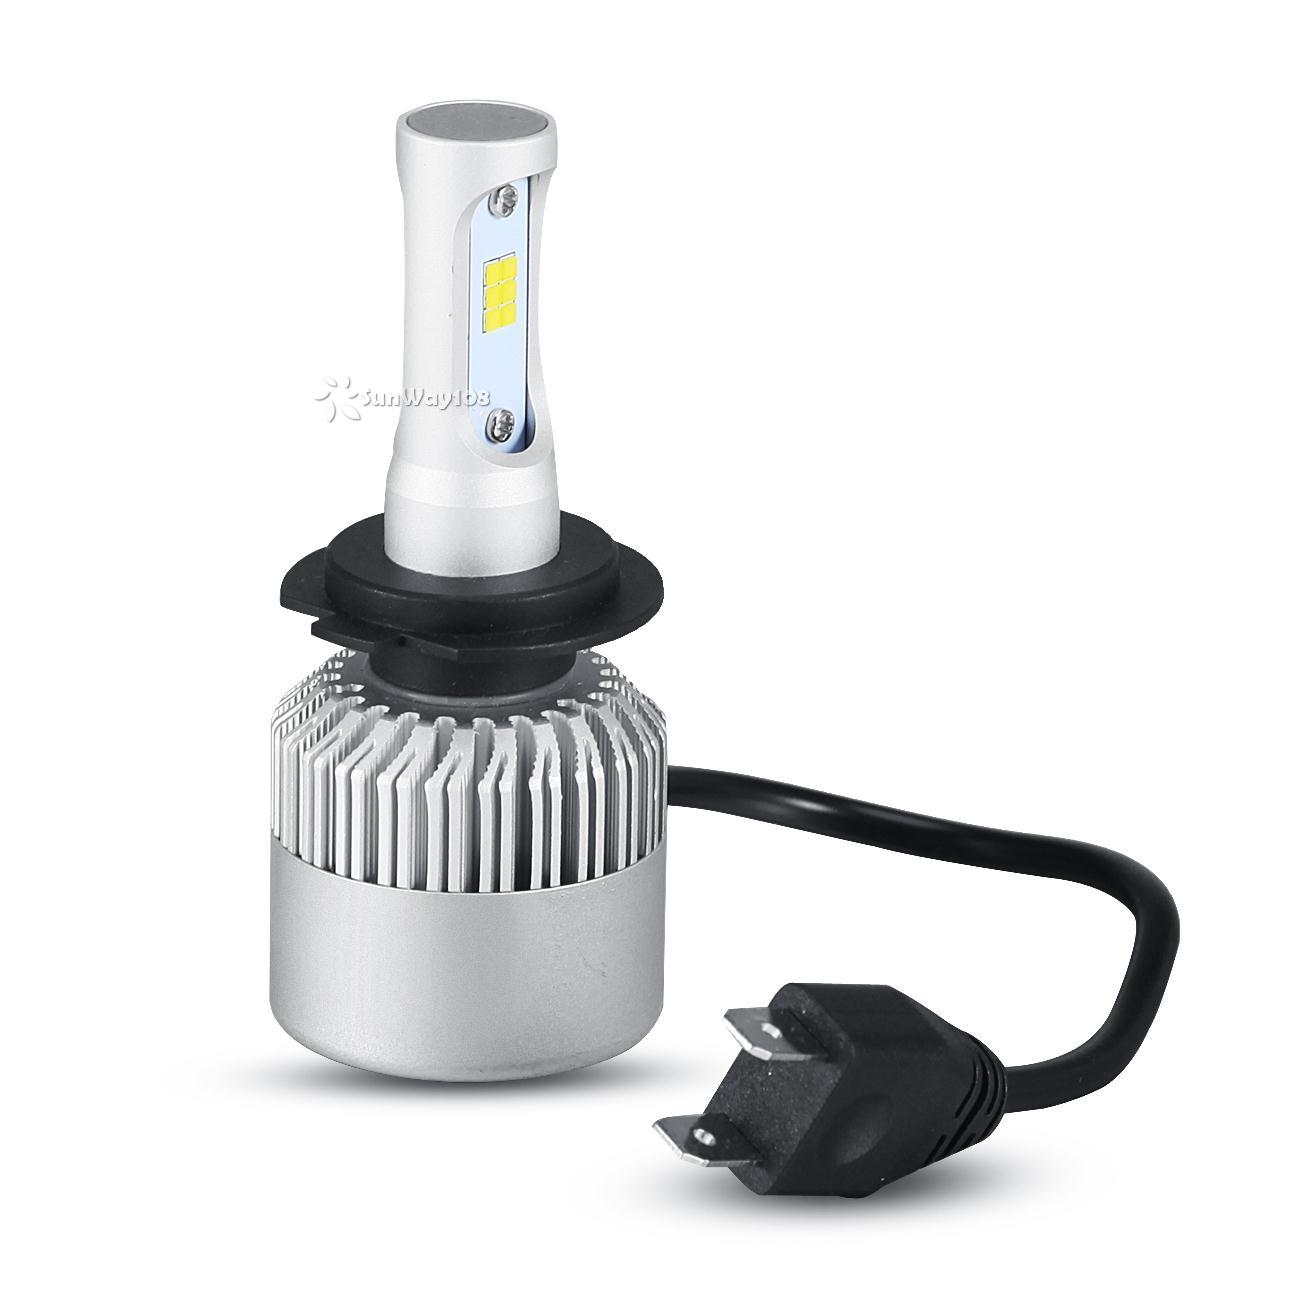 h7 philips 252w 25200lms led headlight single beam lamp bulbs kit 6500k ebay. Black Bedroom Furniture Sets. Home Design Ideas